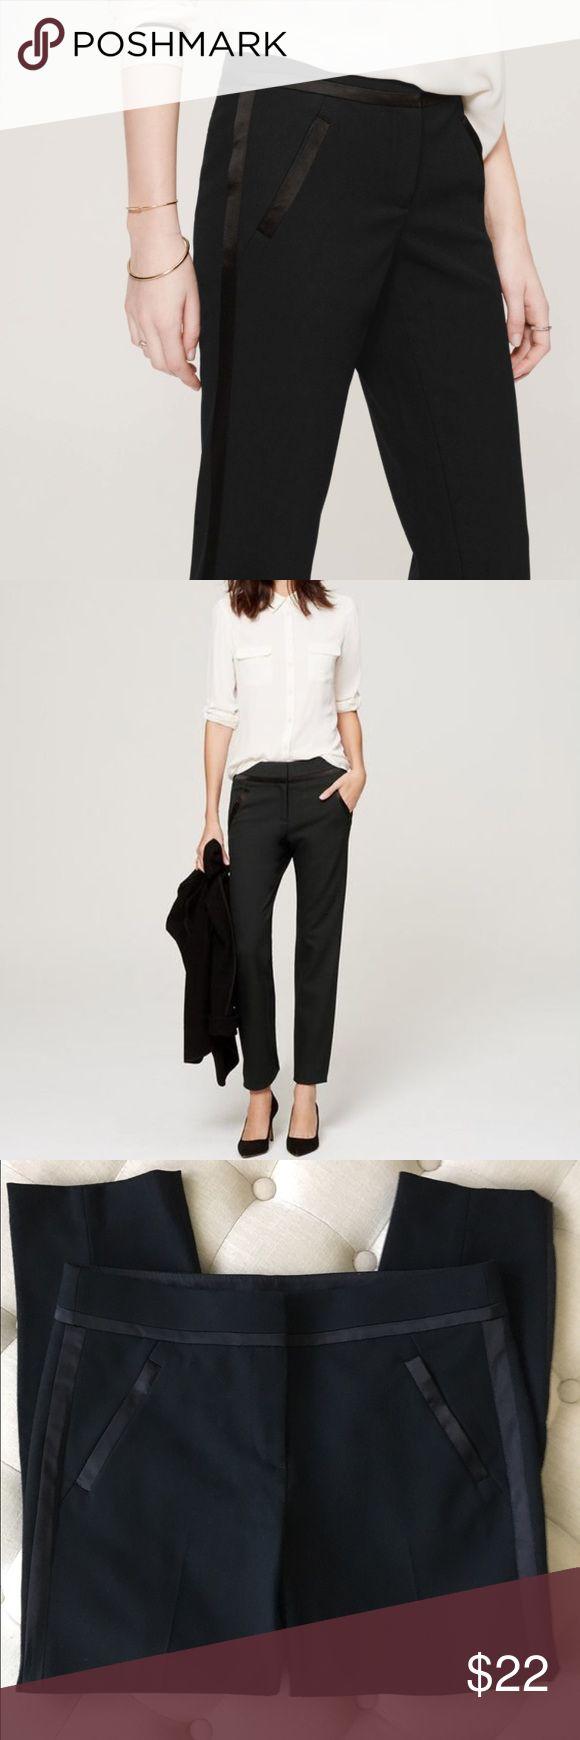 "NWOT Loft Tuxedo Stripe Cropped Marisa Pants sz 8P Awesome Loft black tuxedo stripe cropped pants in Marisa fit size 8 P. Brand new ❤ Waist 33"", inseam 26"", length 35"". LOFT Pants Ankle & Cropped"